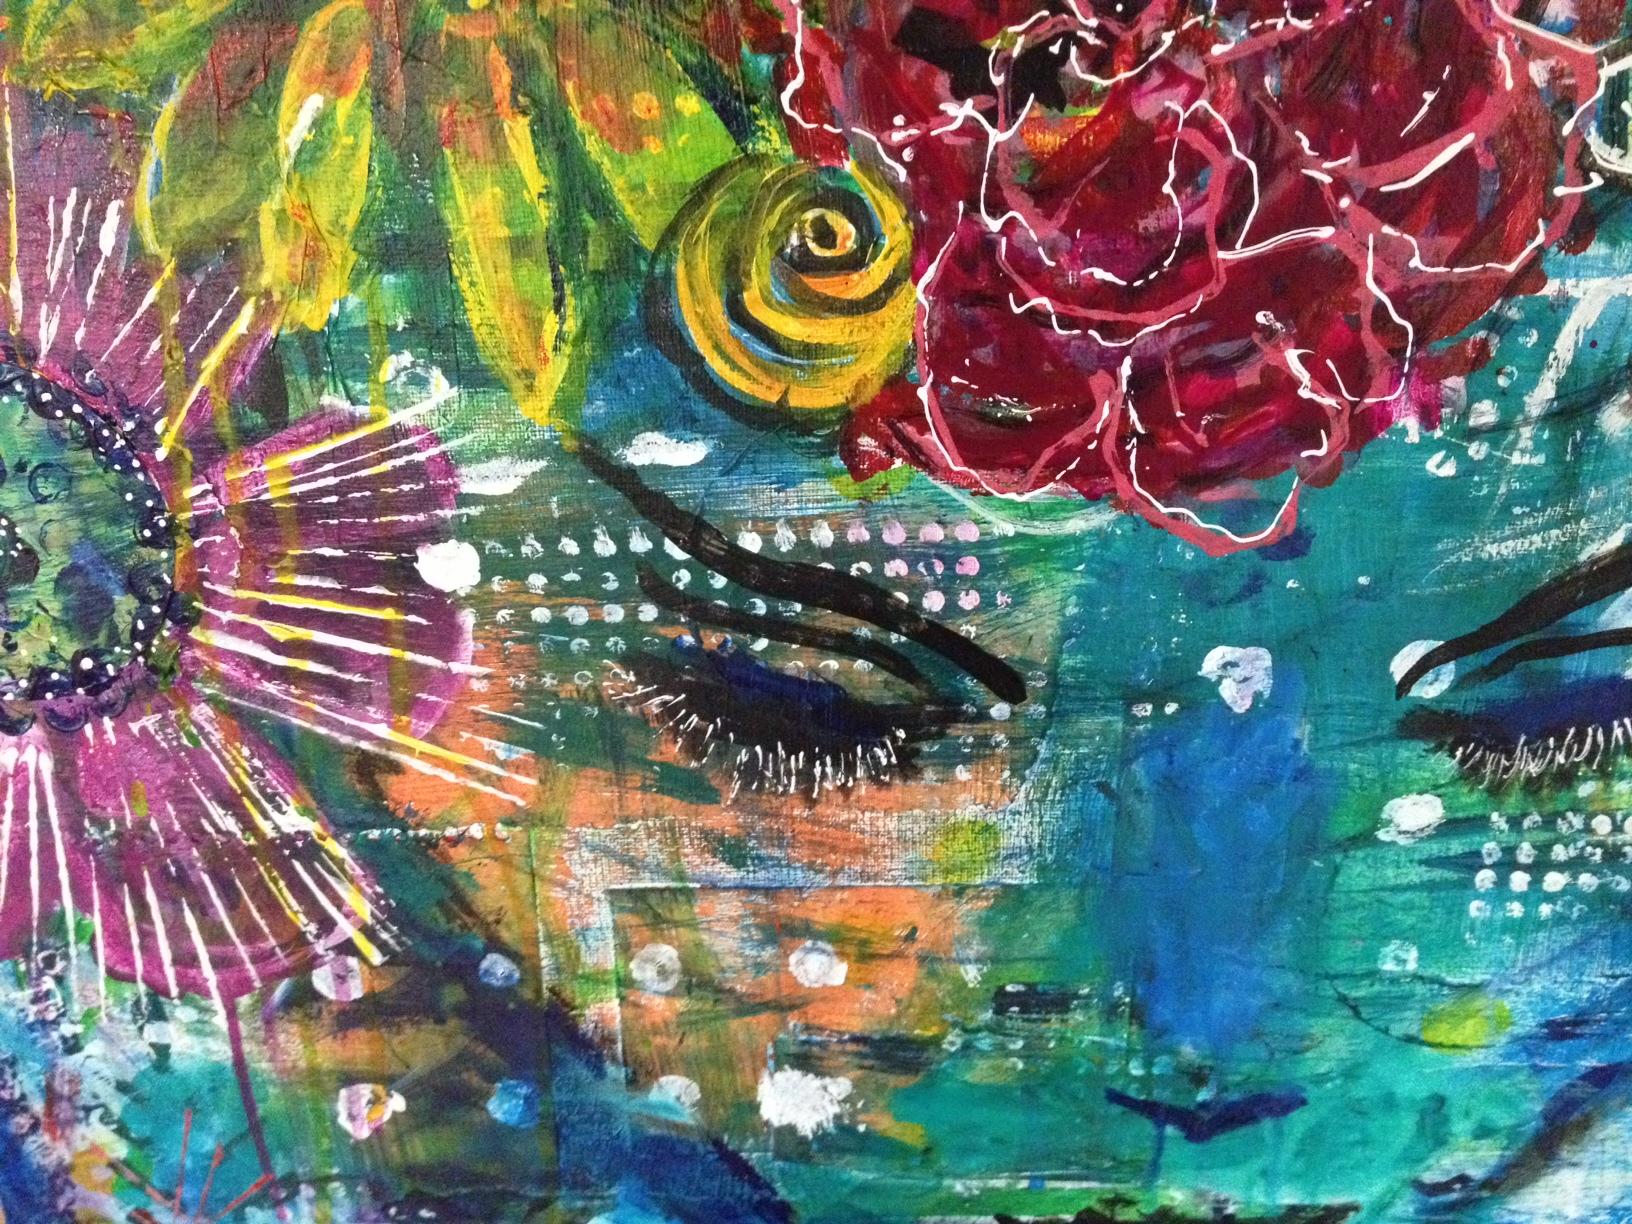 In Flowers, mixed media (paper on acrylic on canvas), work-in-progress © paula boyd farrington 2014